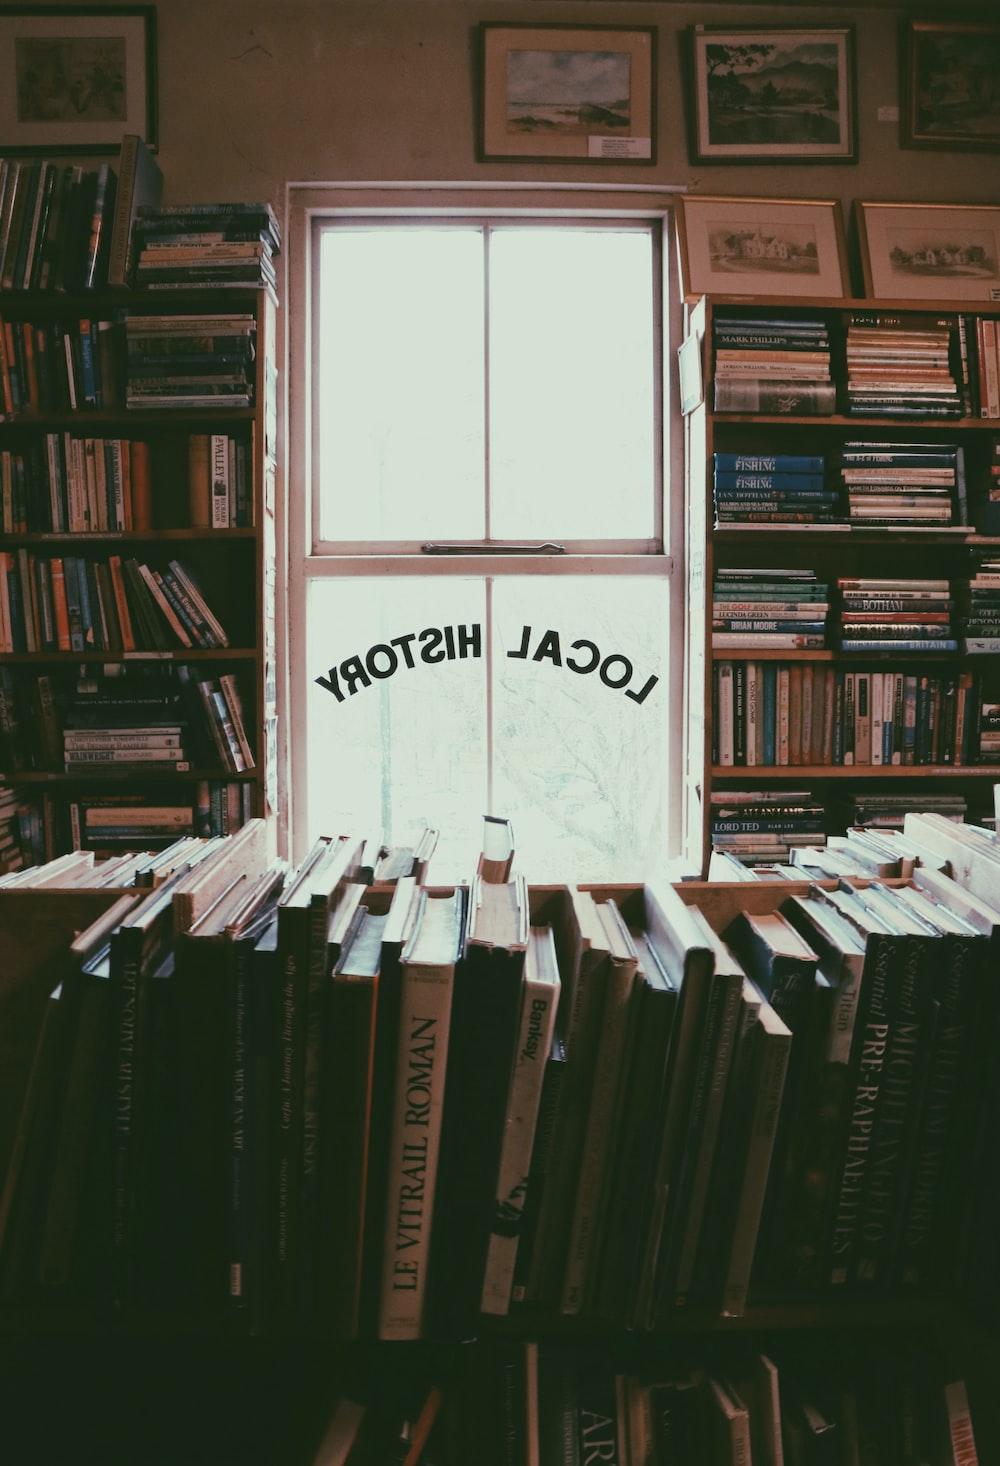 assorted-title book lot on rack inside room